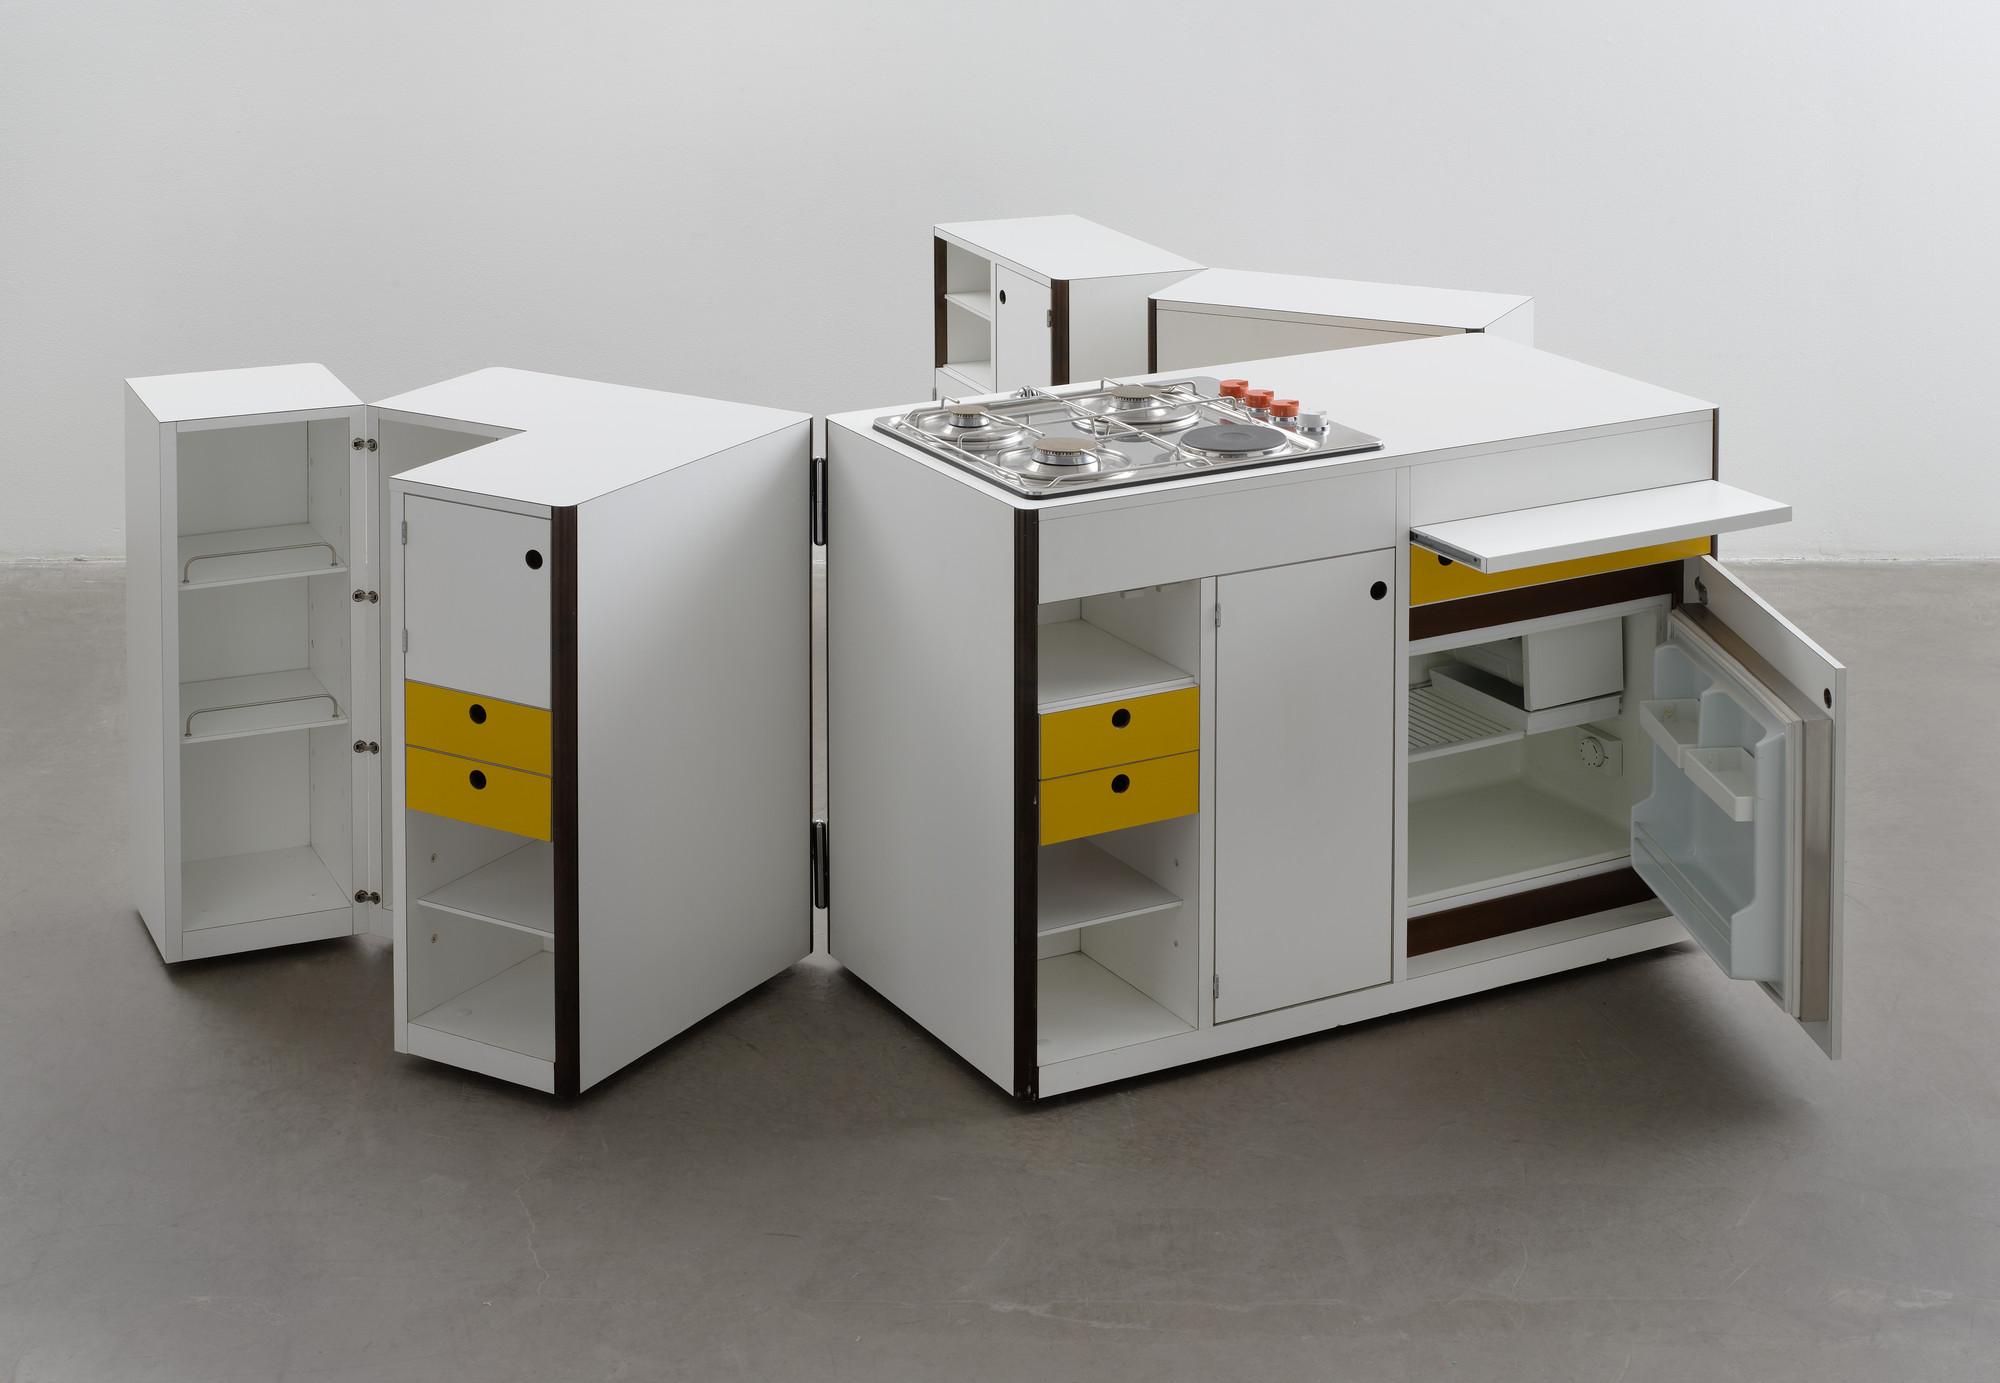 Virgilio Forchiassin Spazio Vivo Living Space Mobile Kitchen Unit Mobile Kitchen Unit 1968 Moma